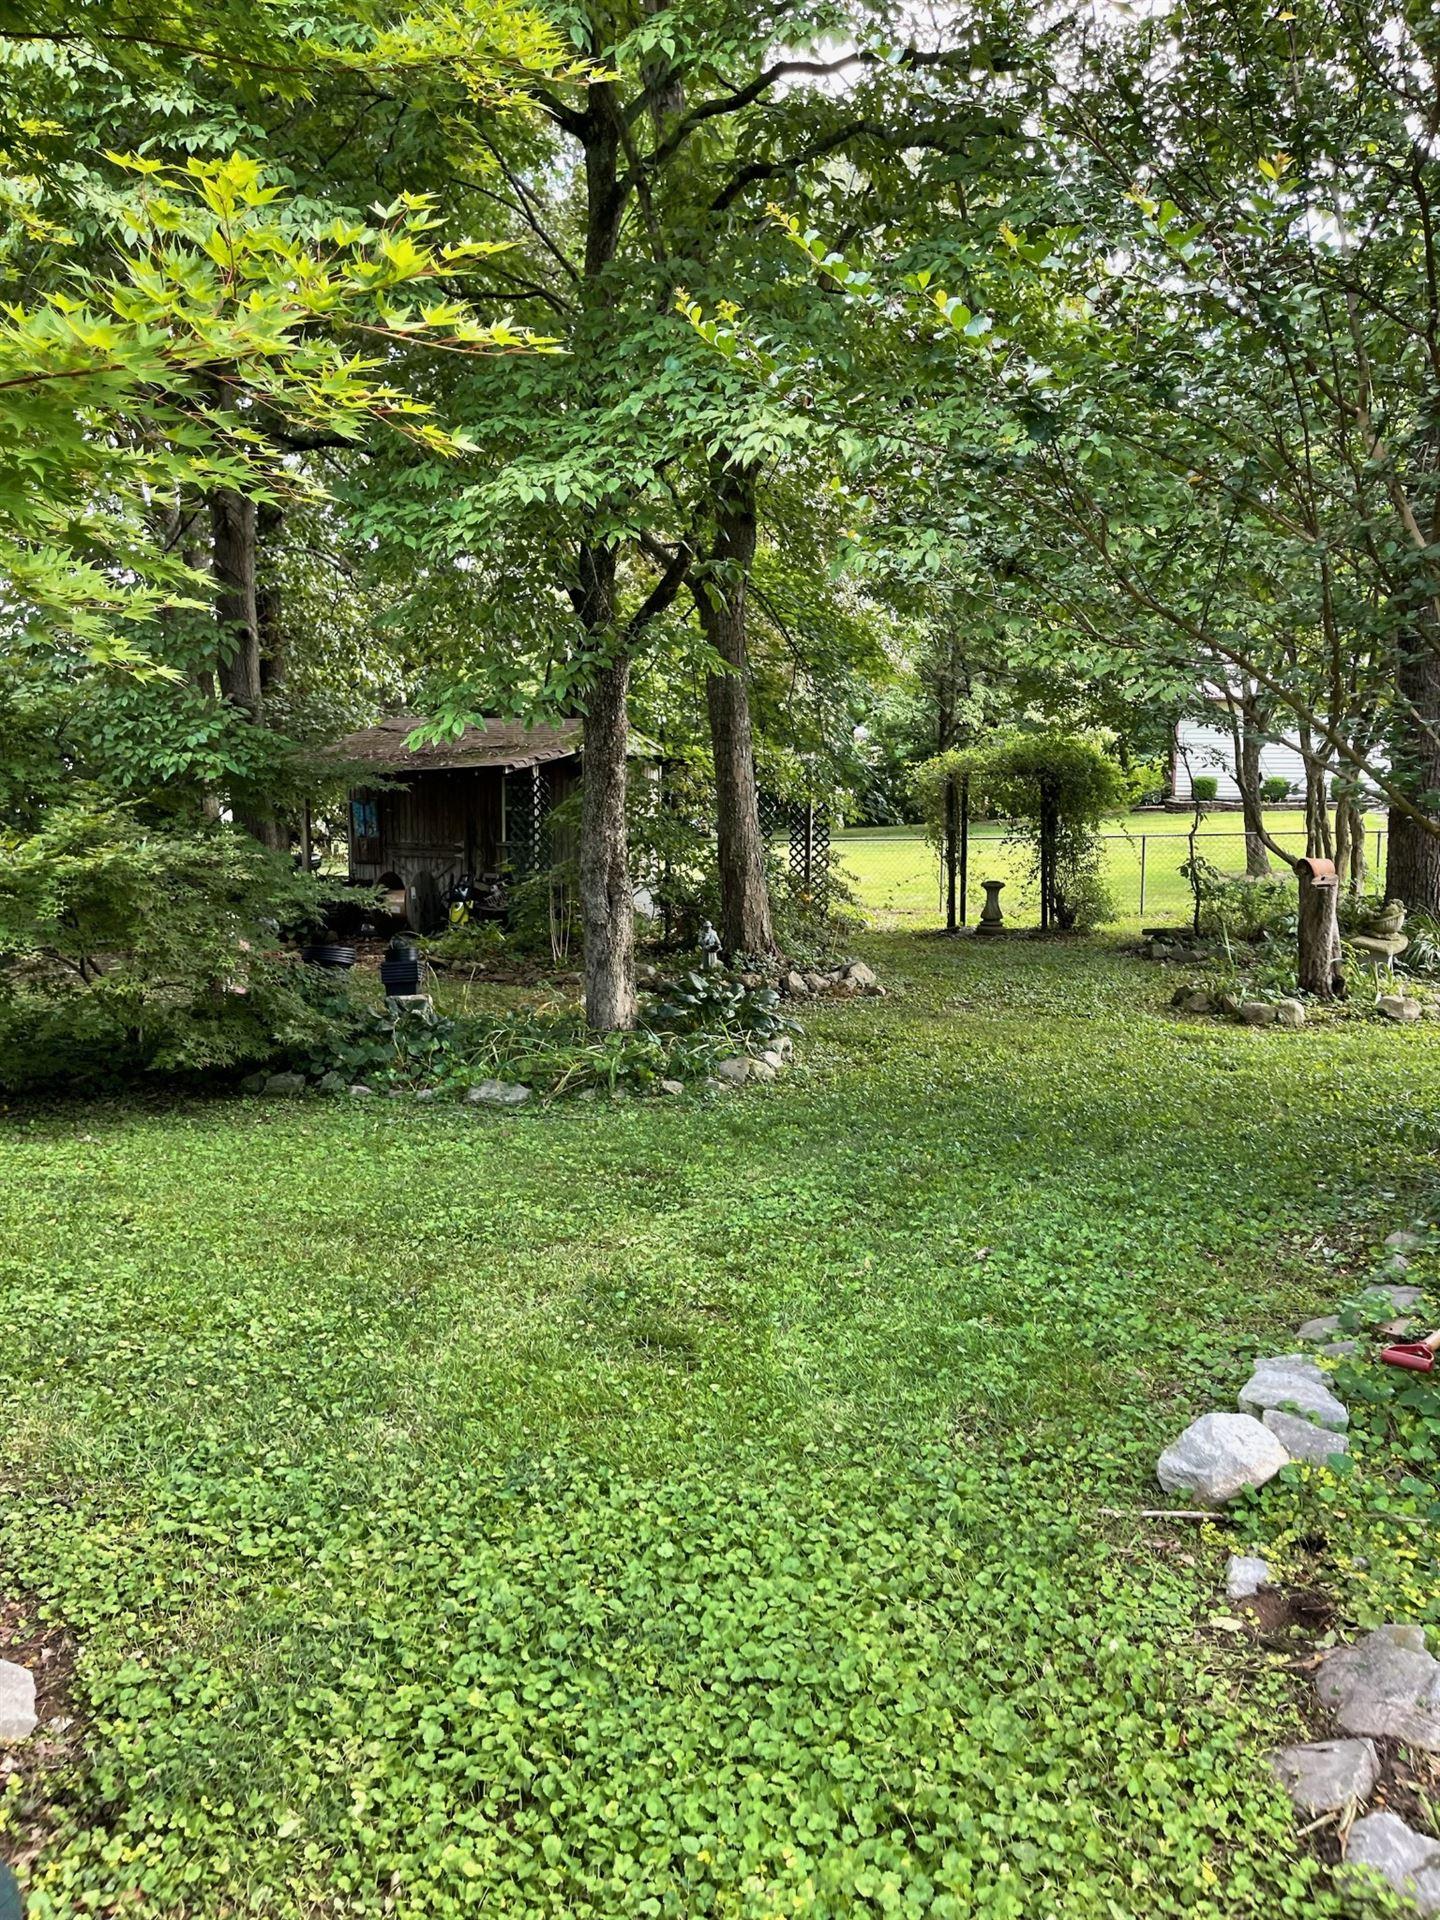 Photo of 2103 Basham Ln, Clarksville, TN 37043 (MLS # 2275649)